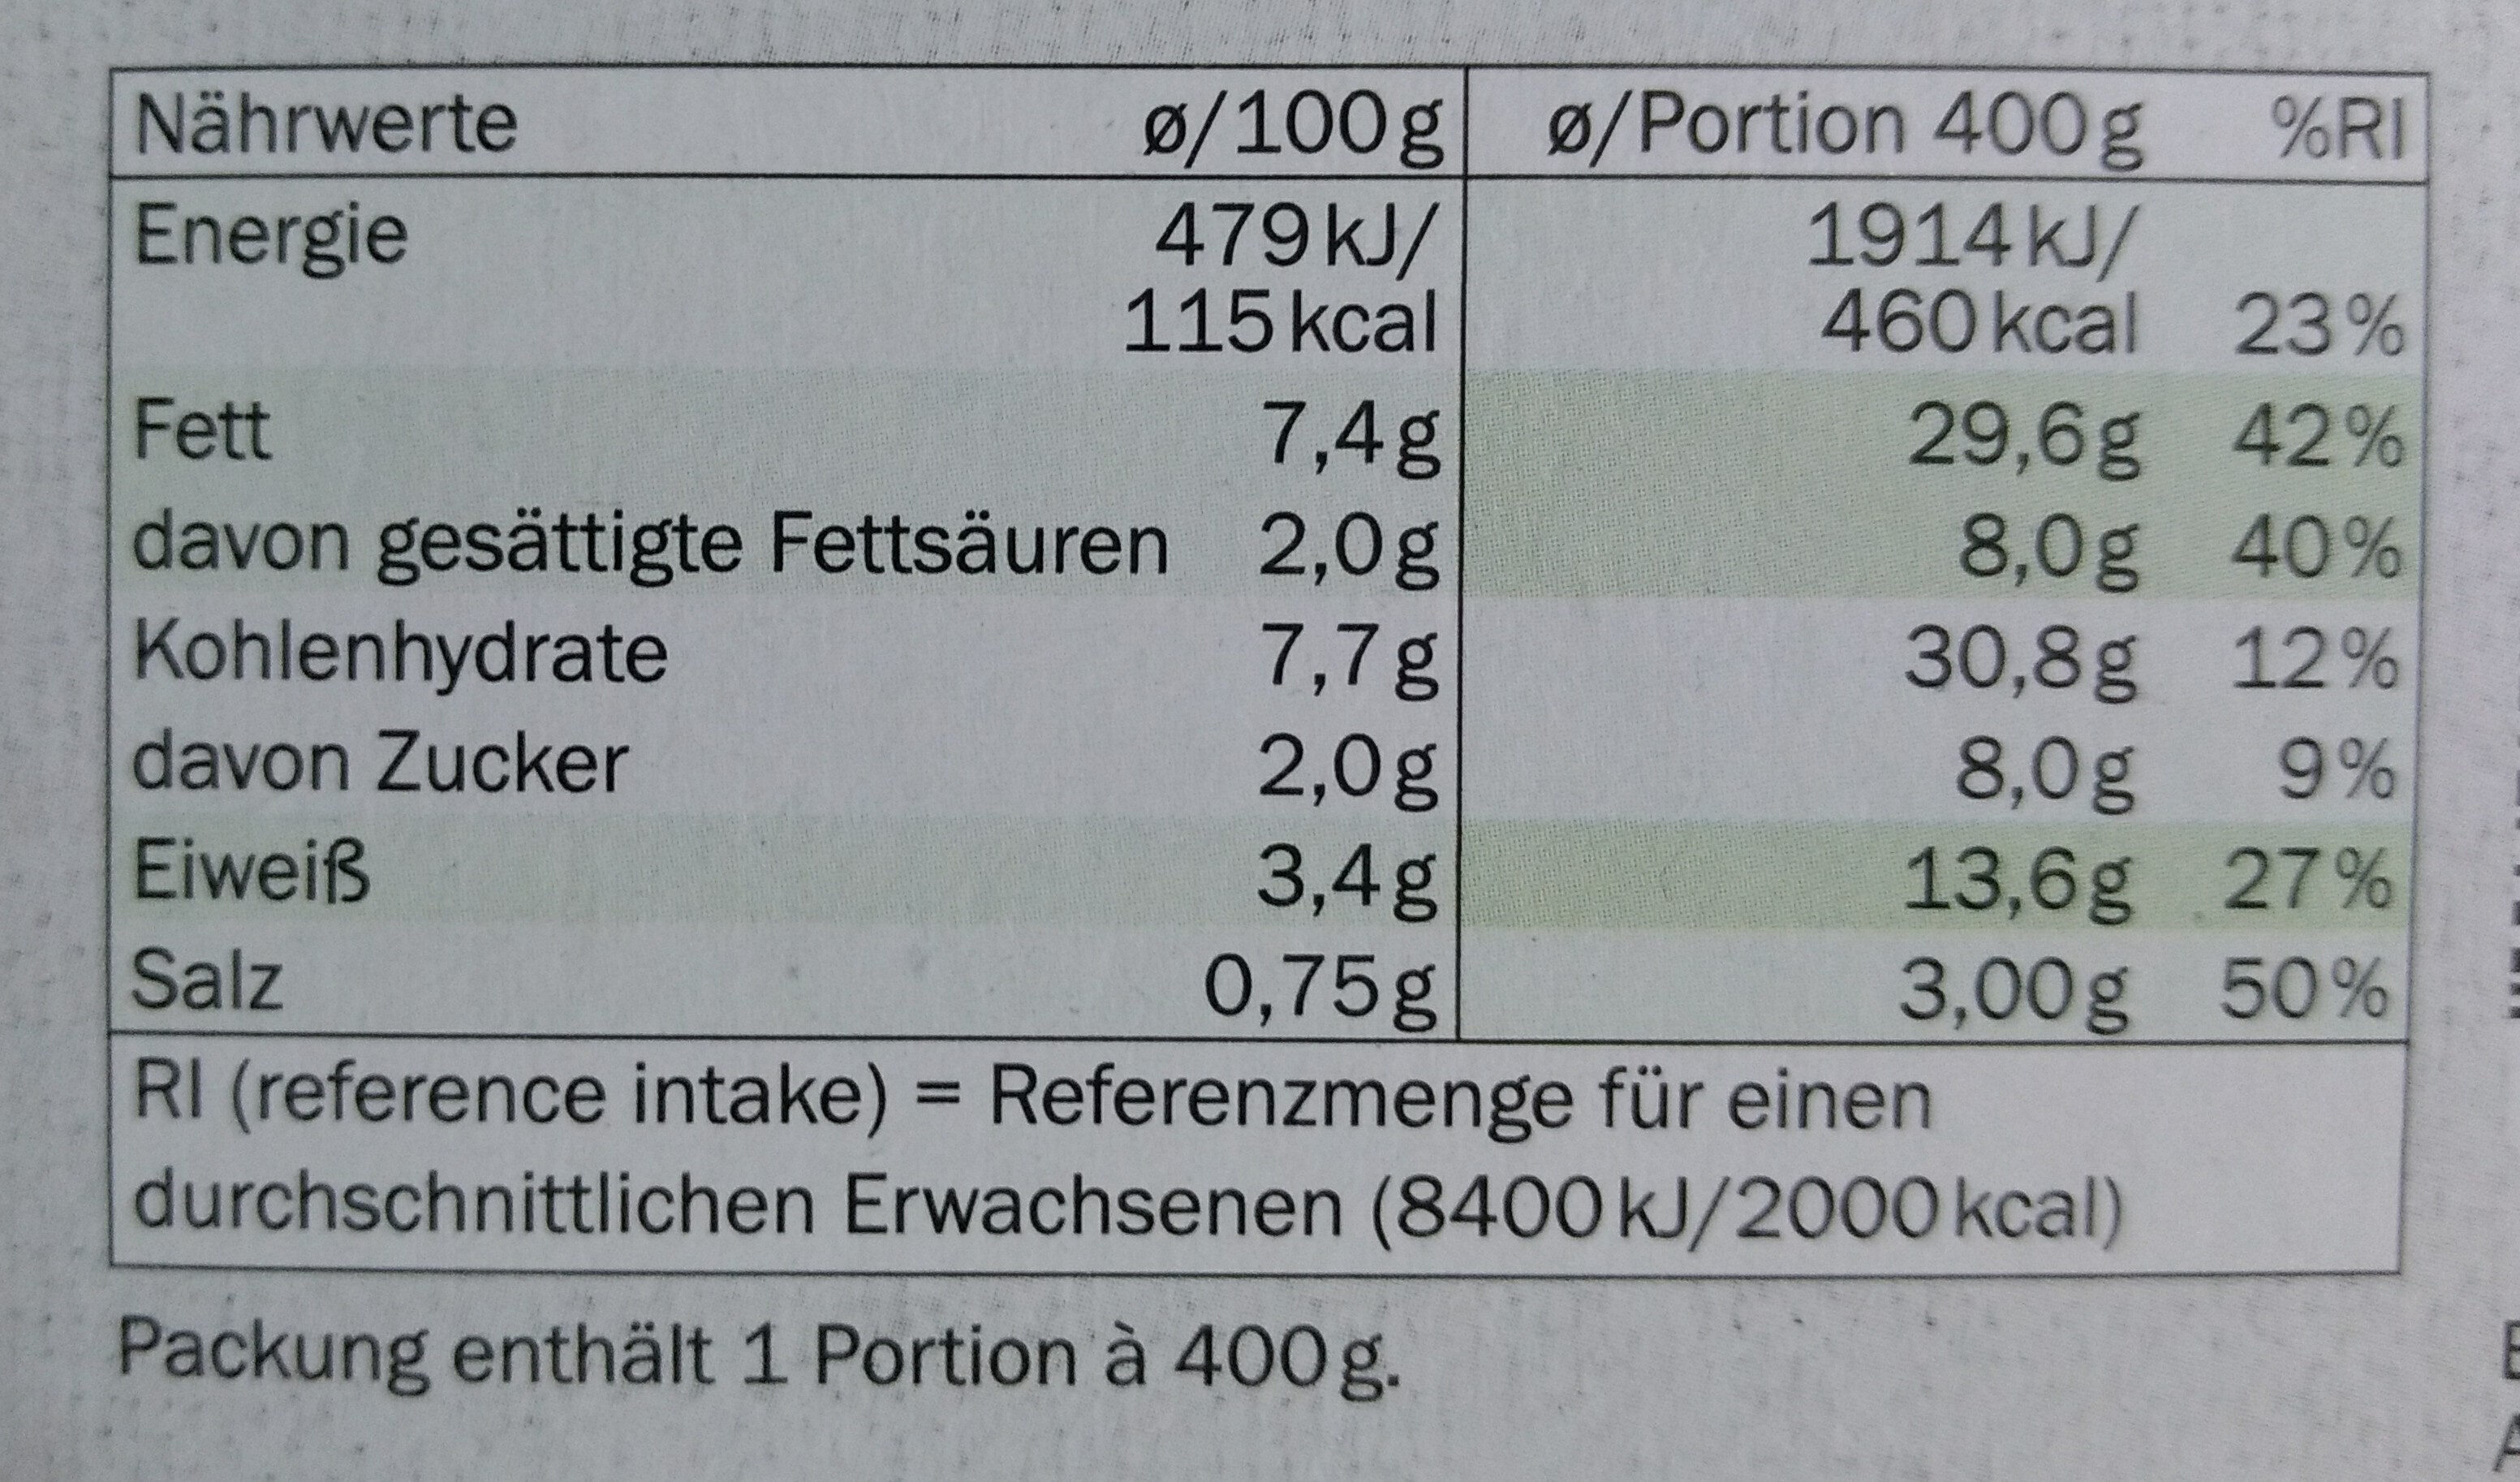 Broccoli-Gratin mit Kartoffeln - Nutrition facts